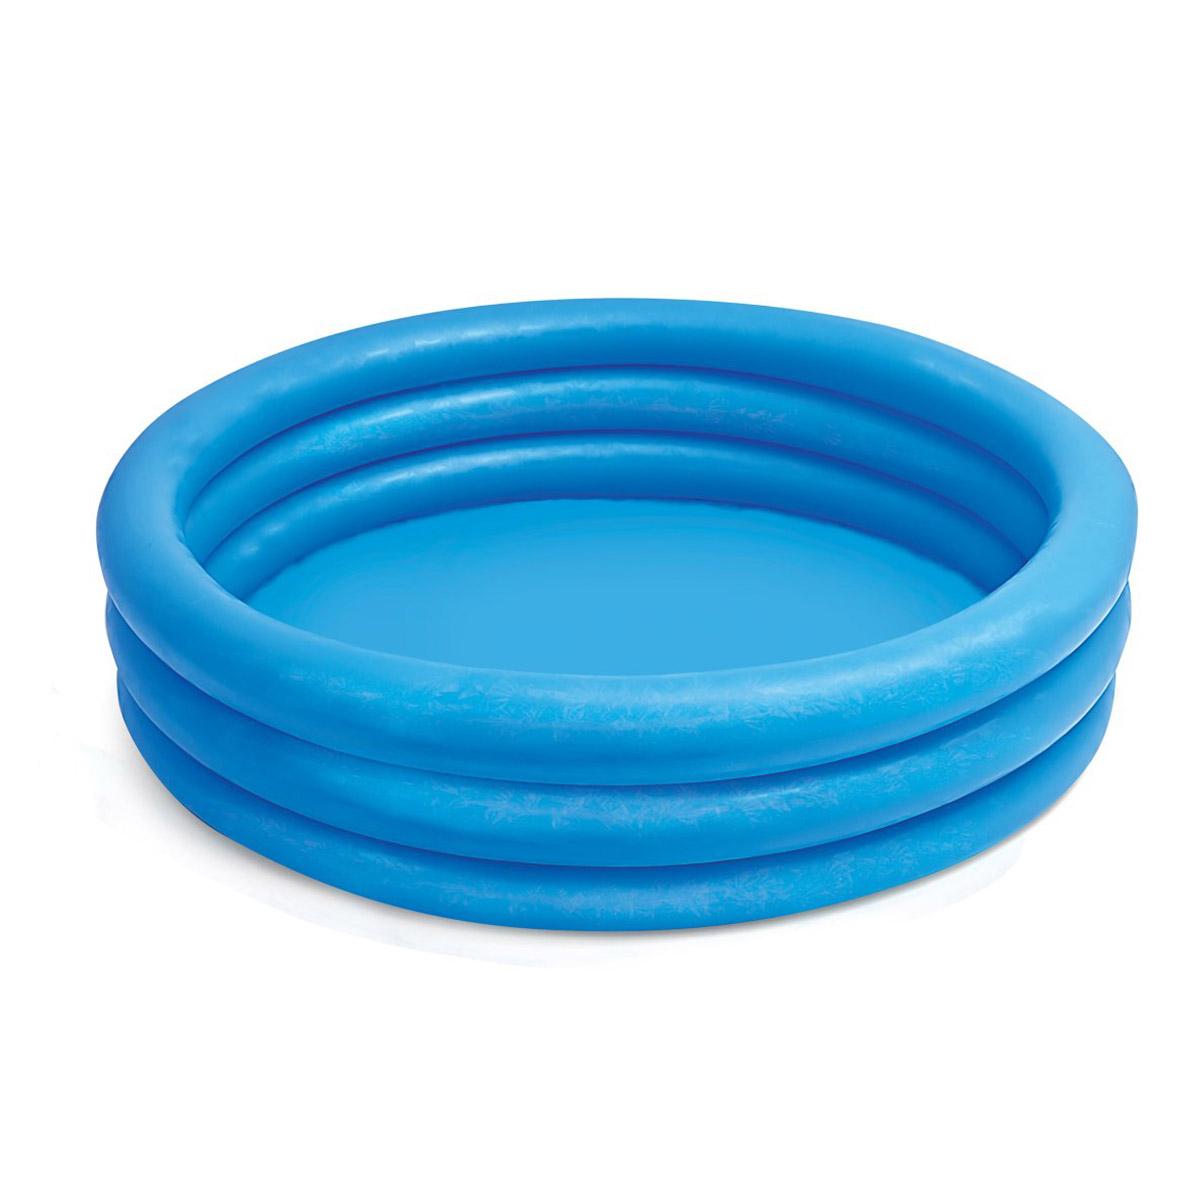 Intex Crystal Blue Pool kinderzwembad 147 x 33 cm